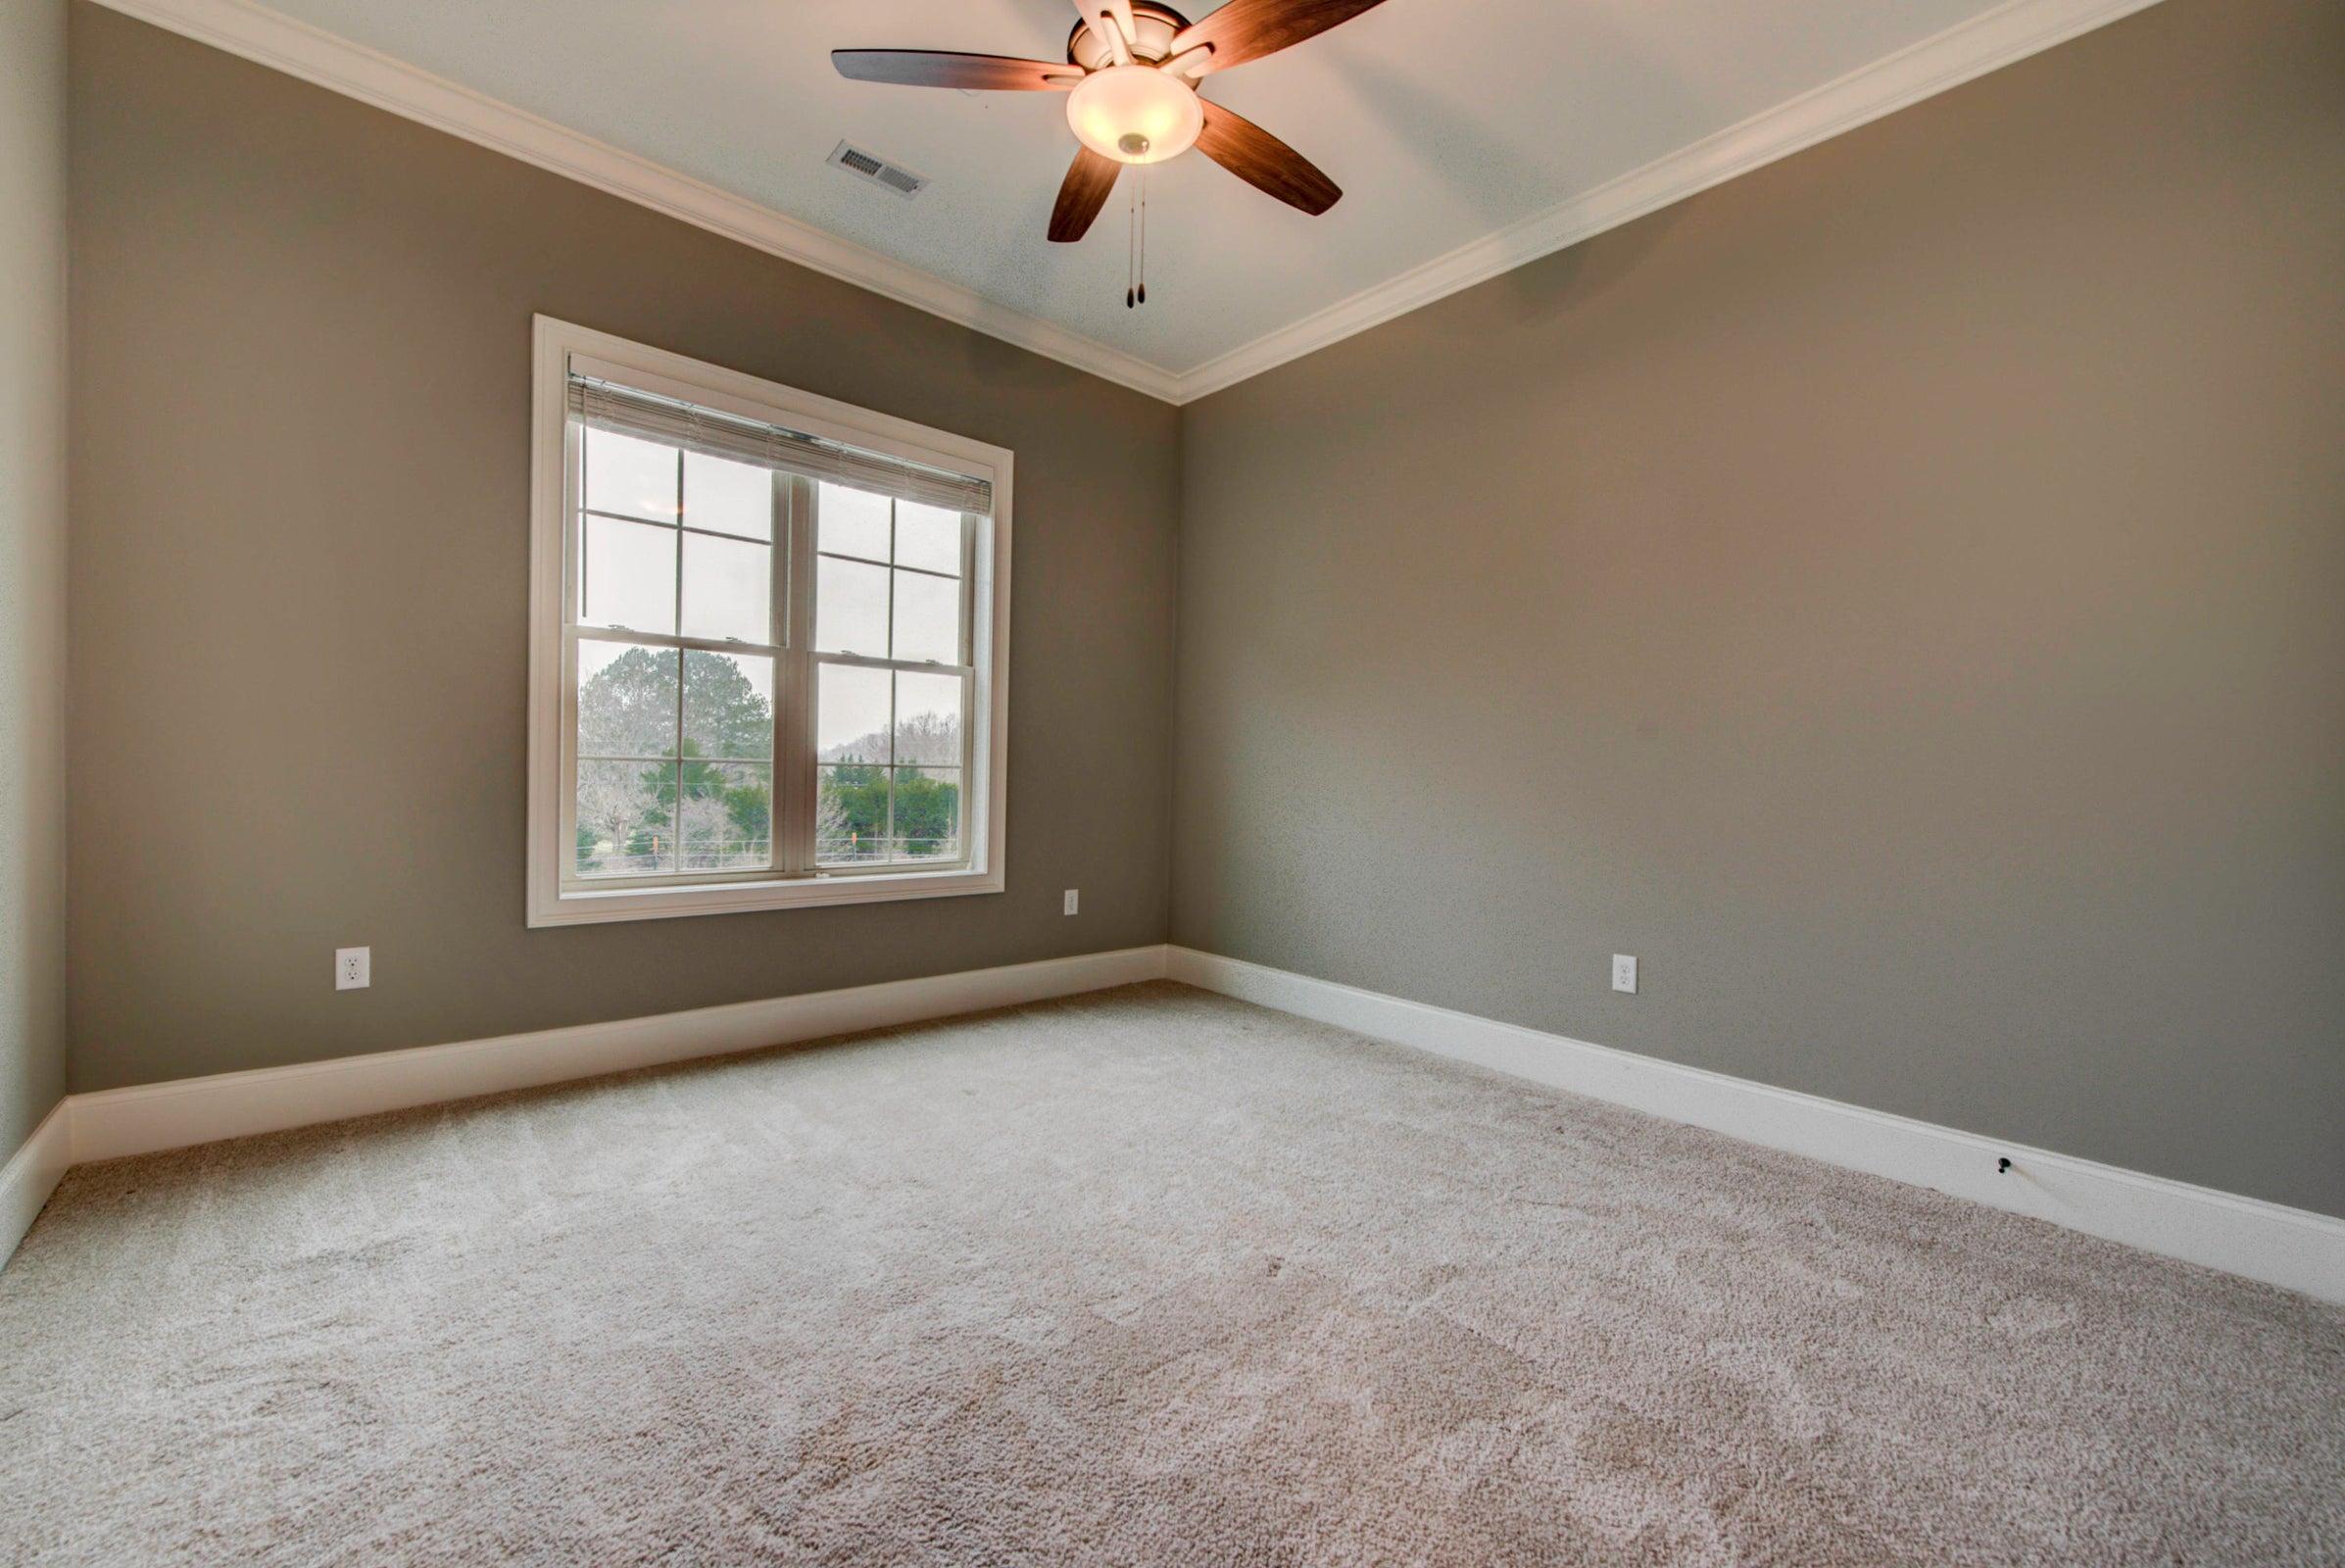 2nd Bedroom/Main